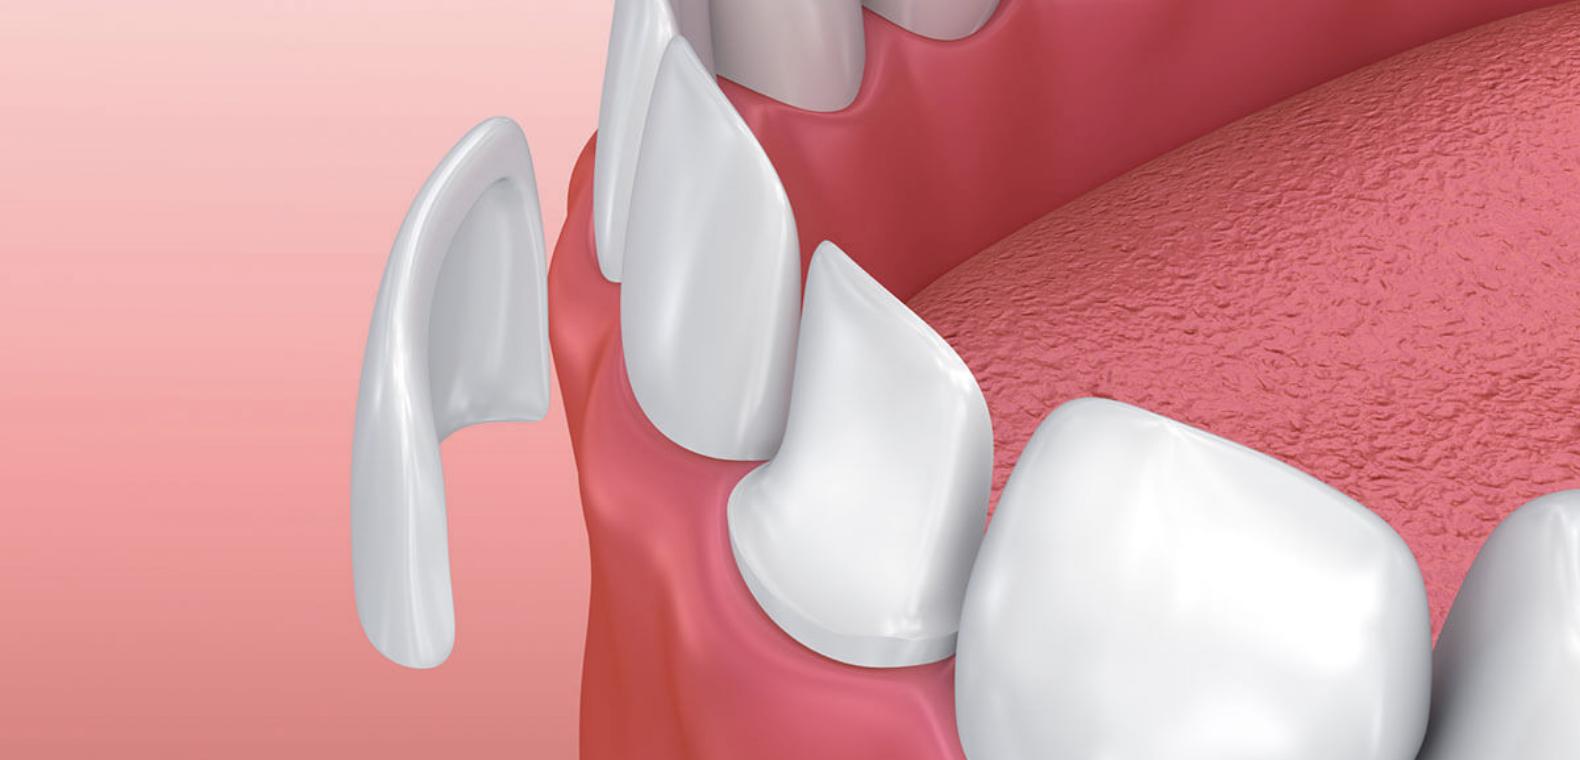 Porcelain Veneers - A Complete Smile Transformation